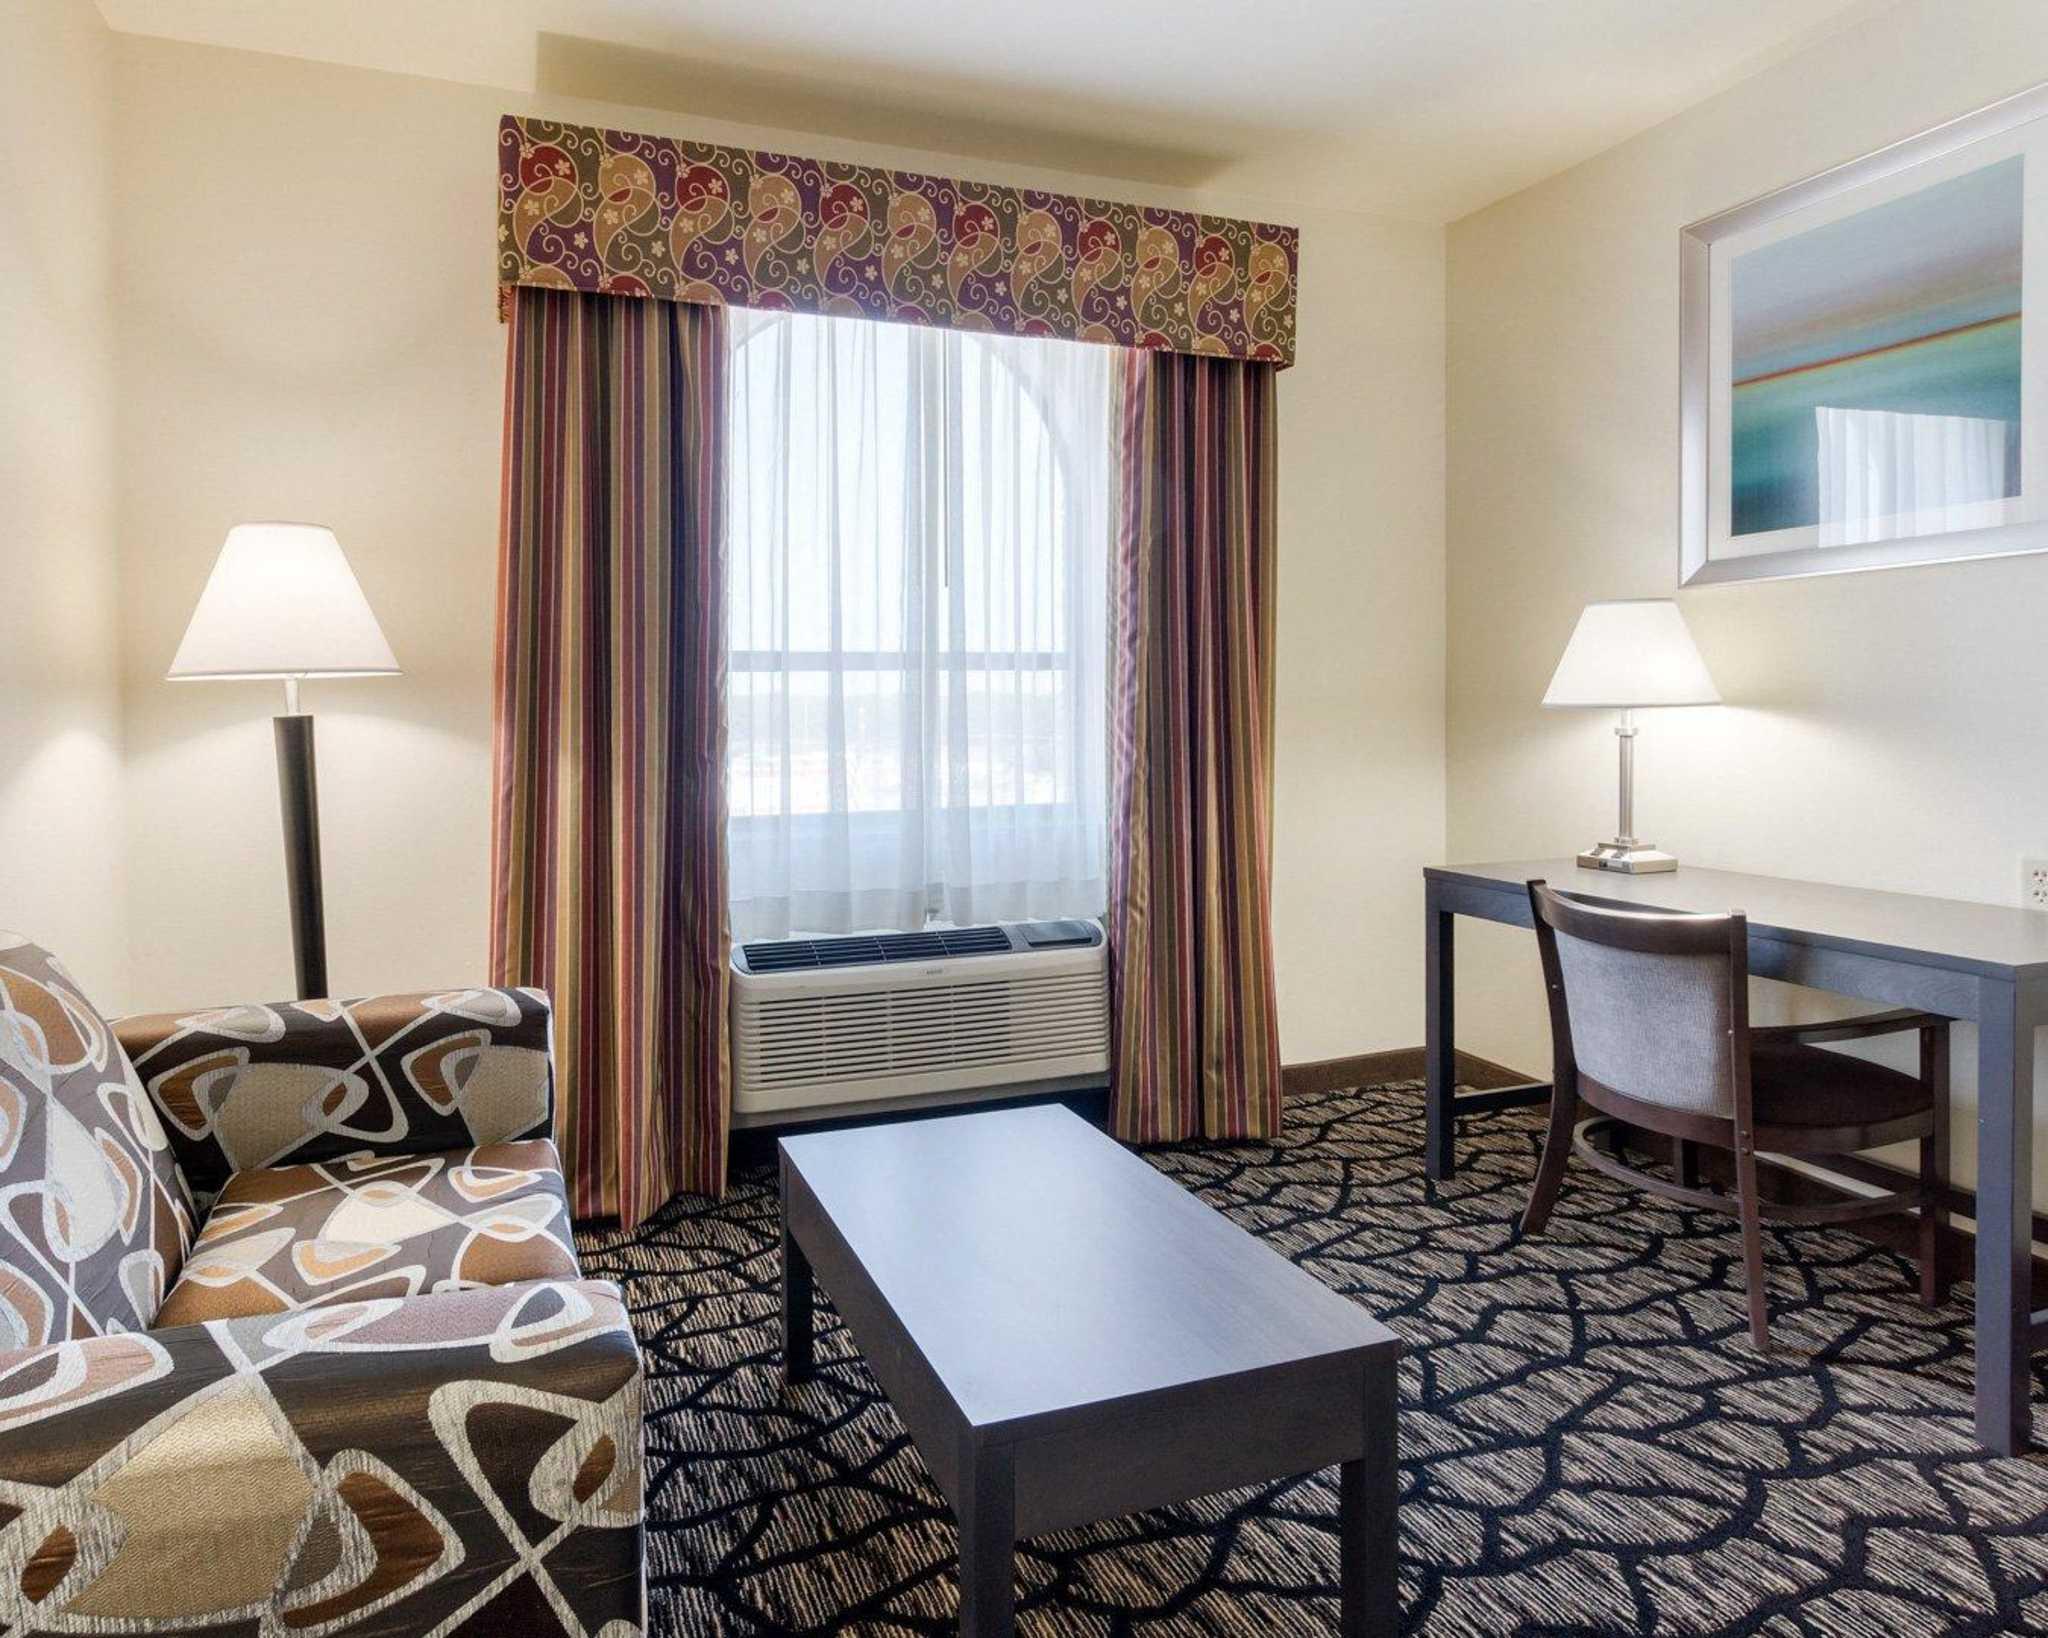 Quality Inn image 24